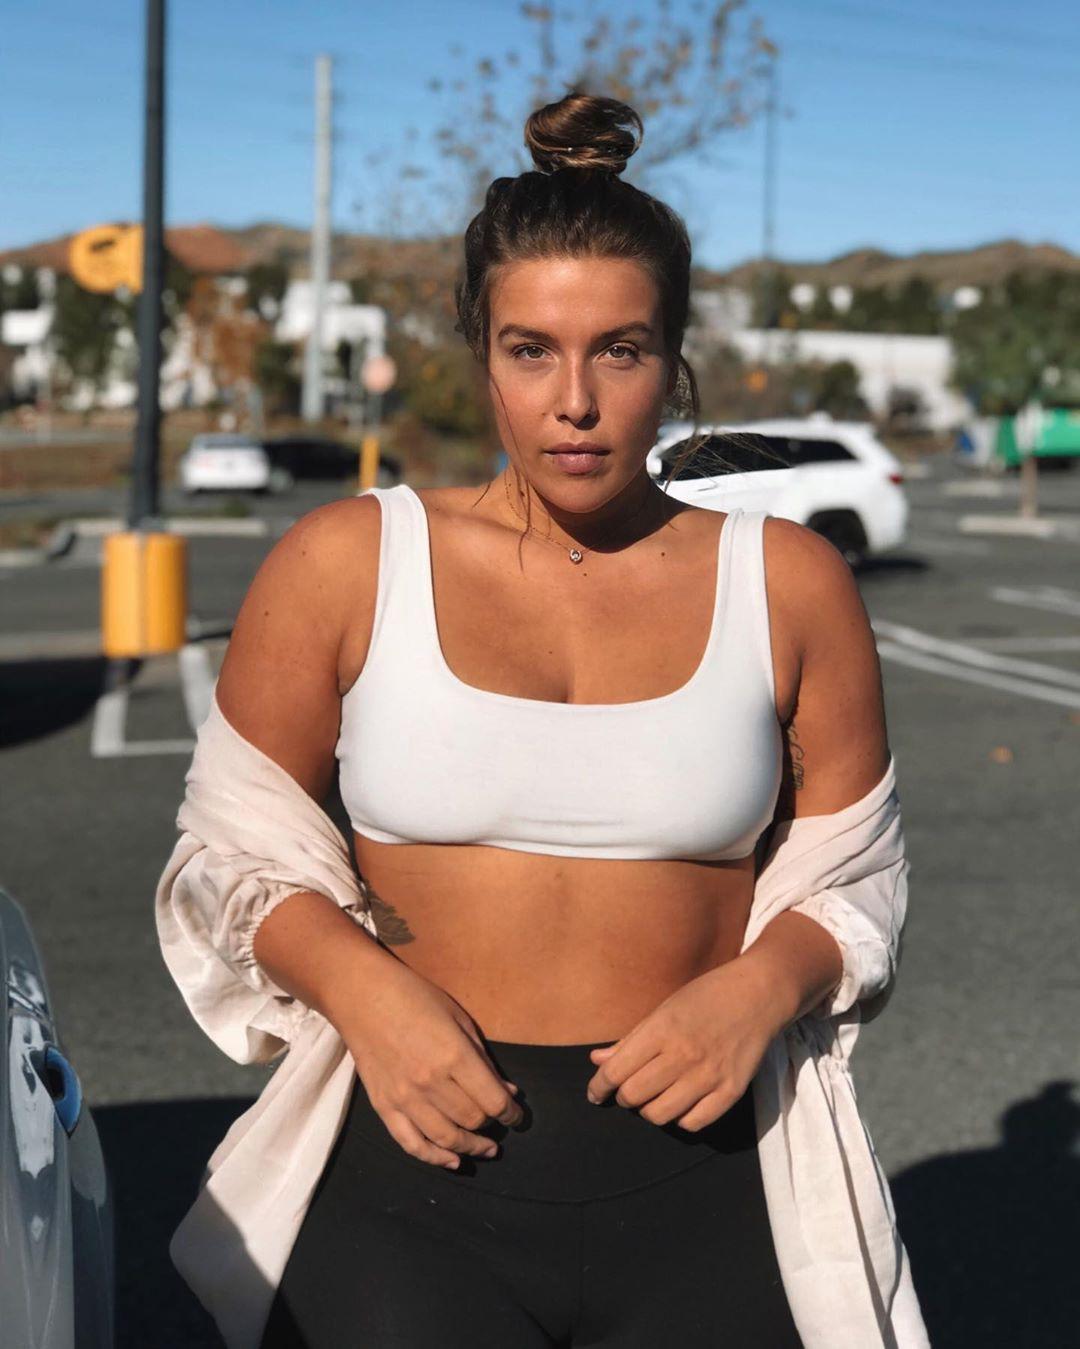 Stephanie Viada hot photo from instagram, undergarment sportswear colour ideas